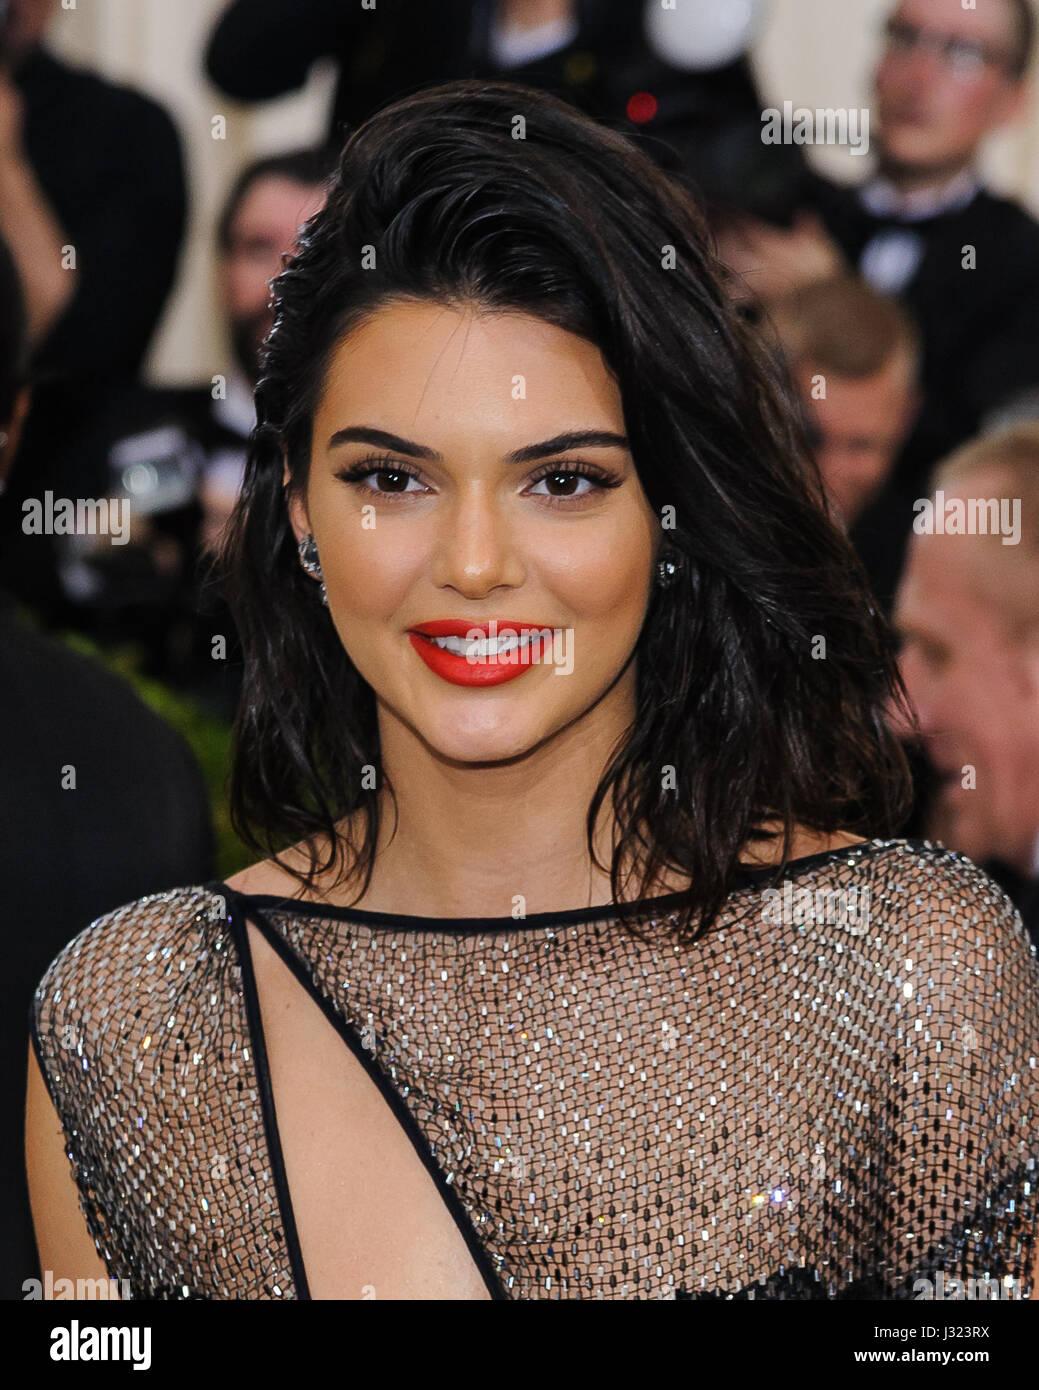 Nueva York, NY, EUA. El 1 de mayo de 2017. Kendall Jenner. 2017 Metropolitan Museum of Art Costume Institute gala Imagen De Stock